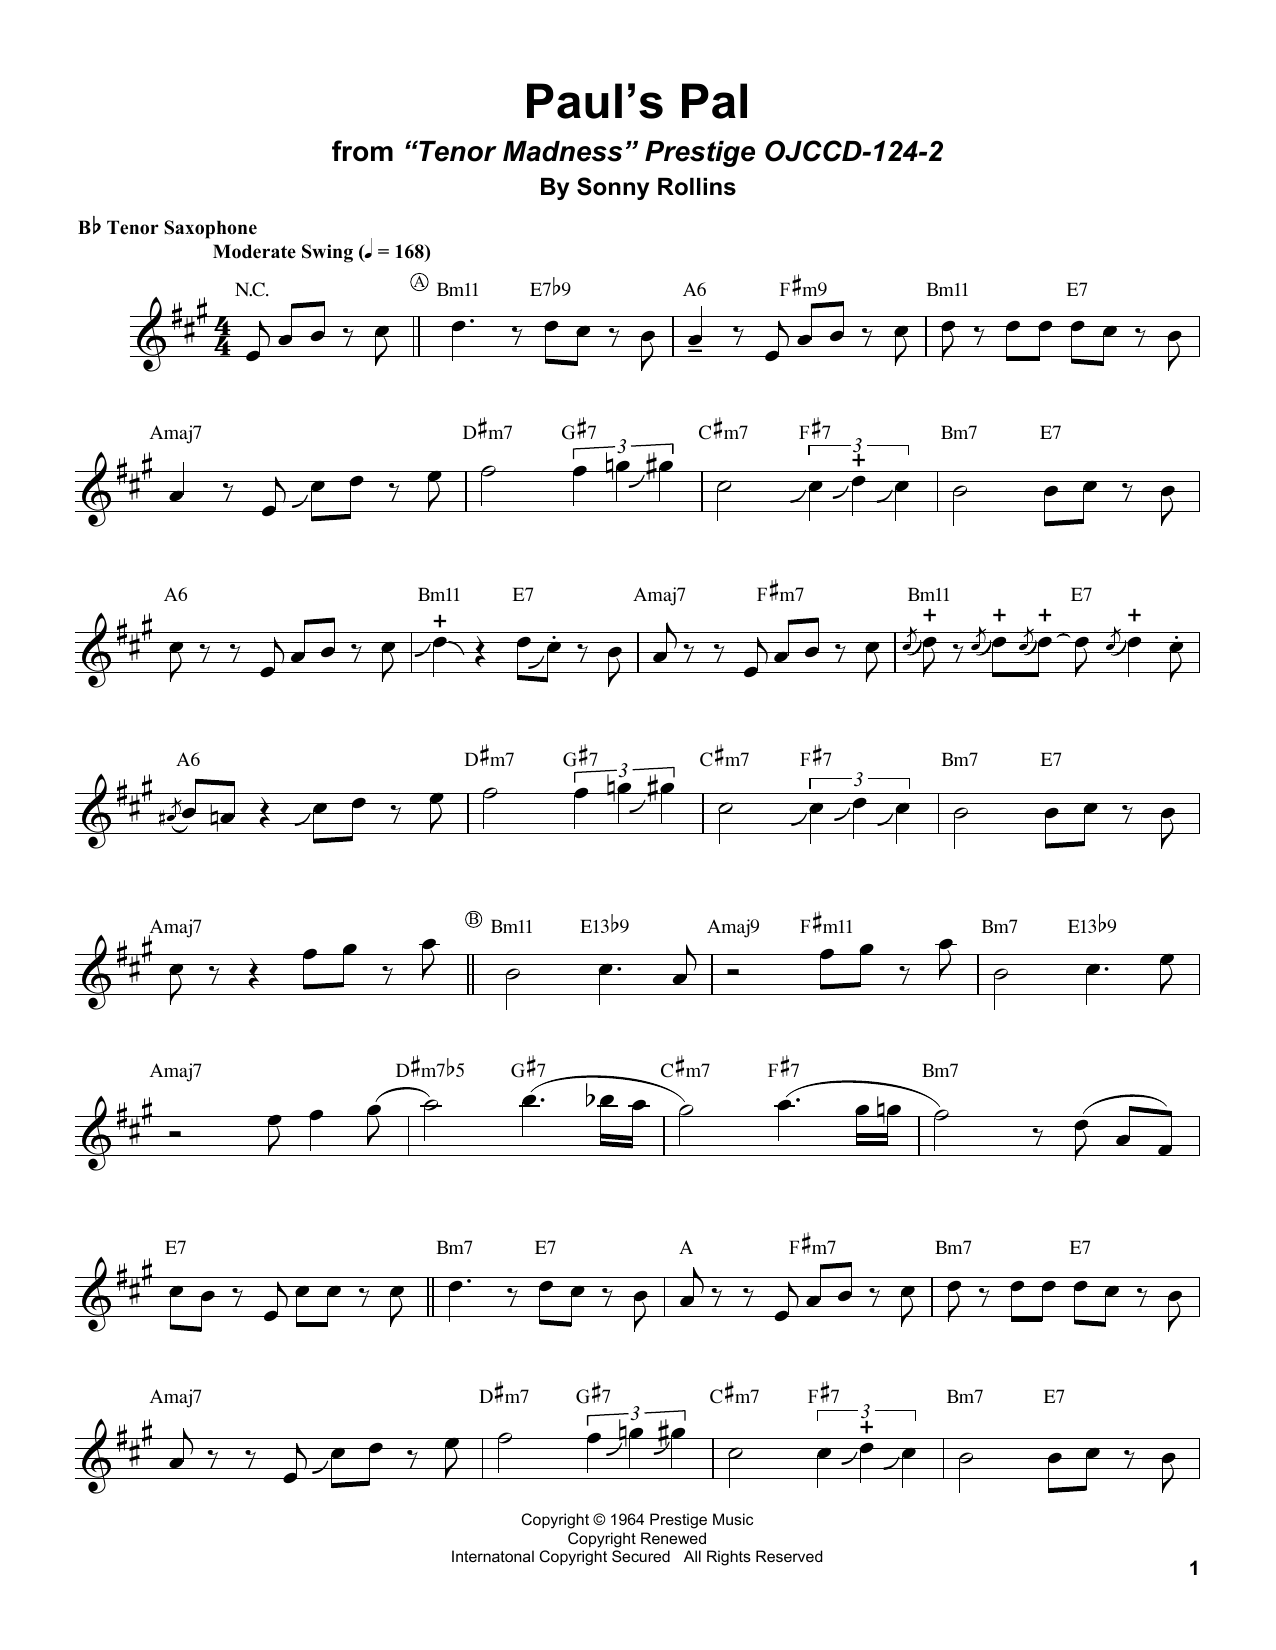 Paul's Pal Sheet Music